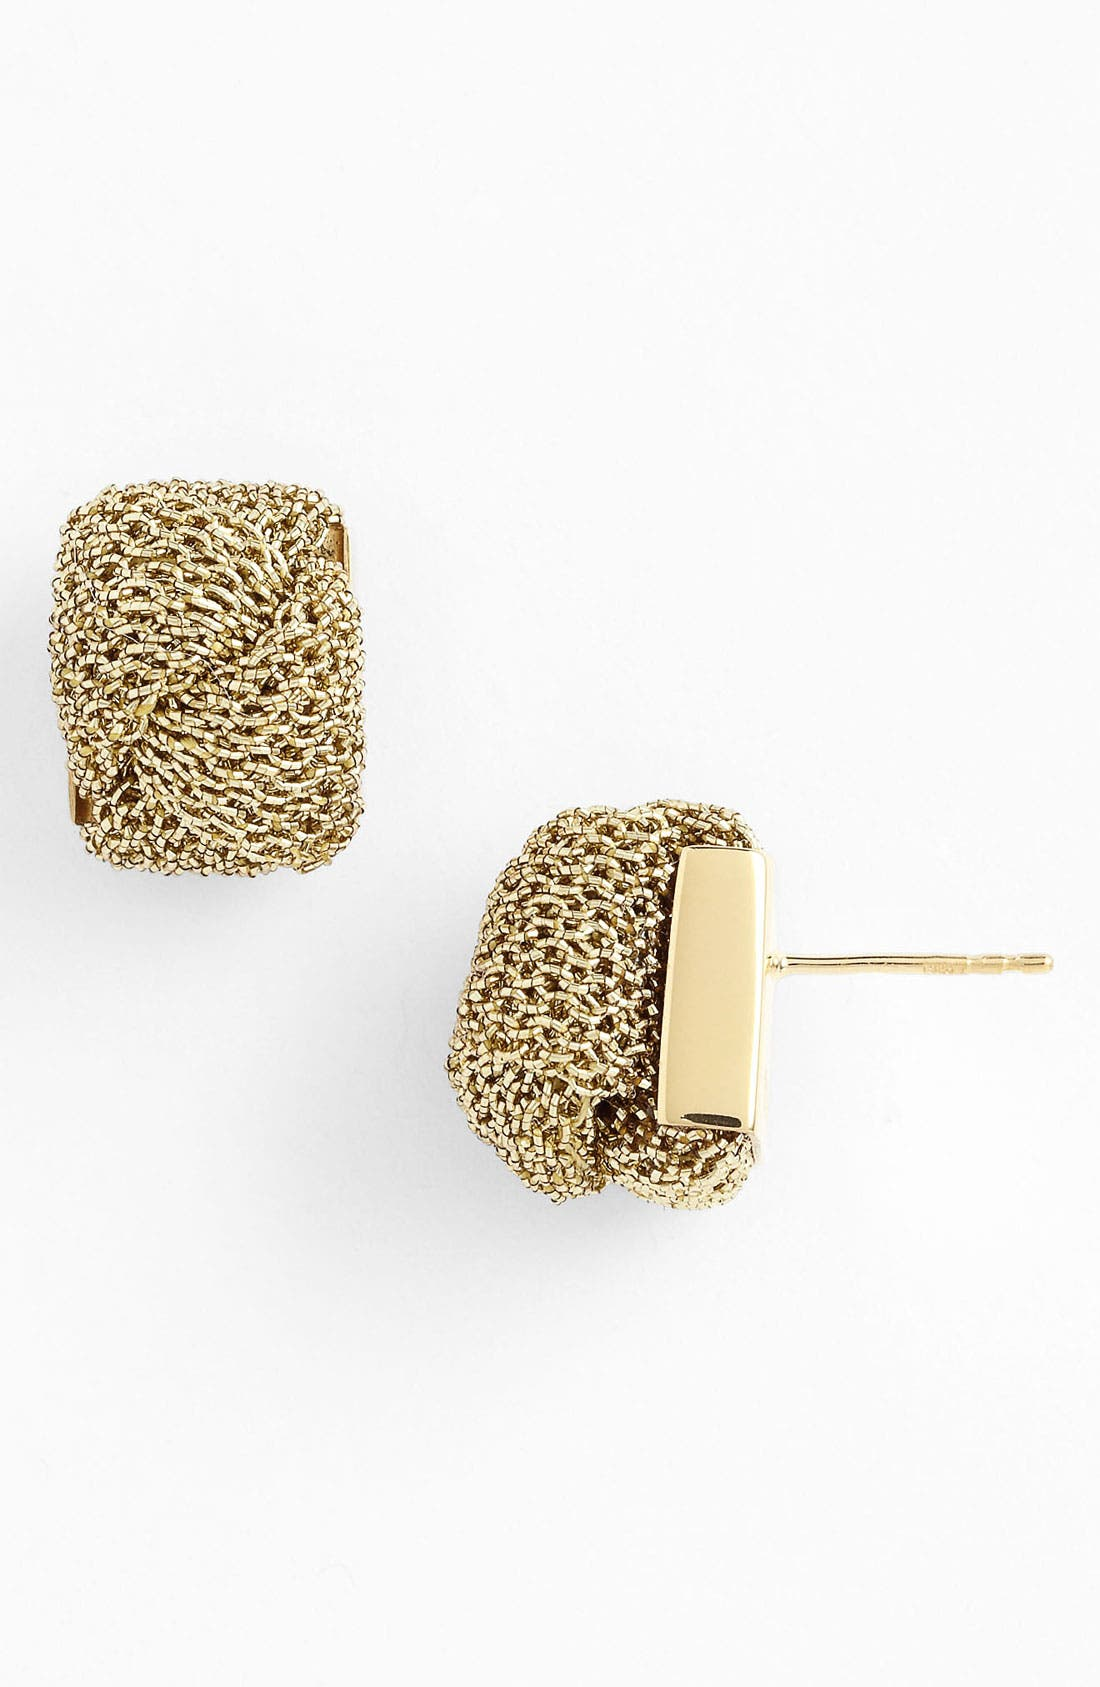 Main Image - Adami & Martucci 'Mesh' Stud Earrings